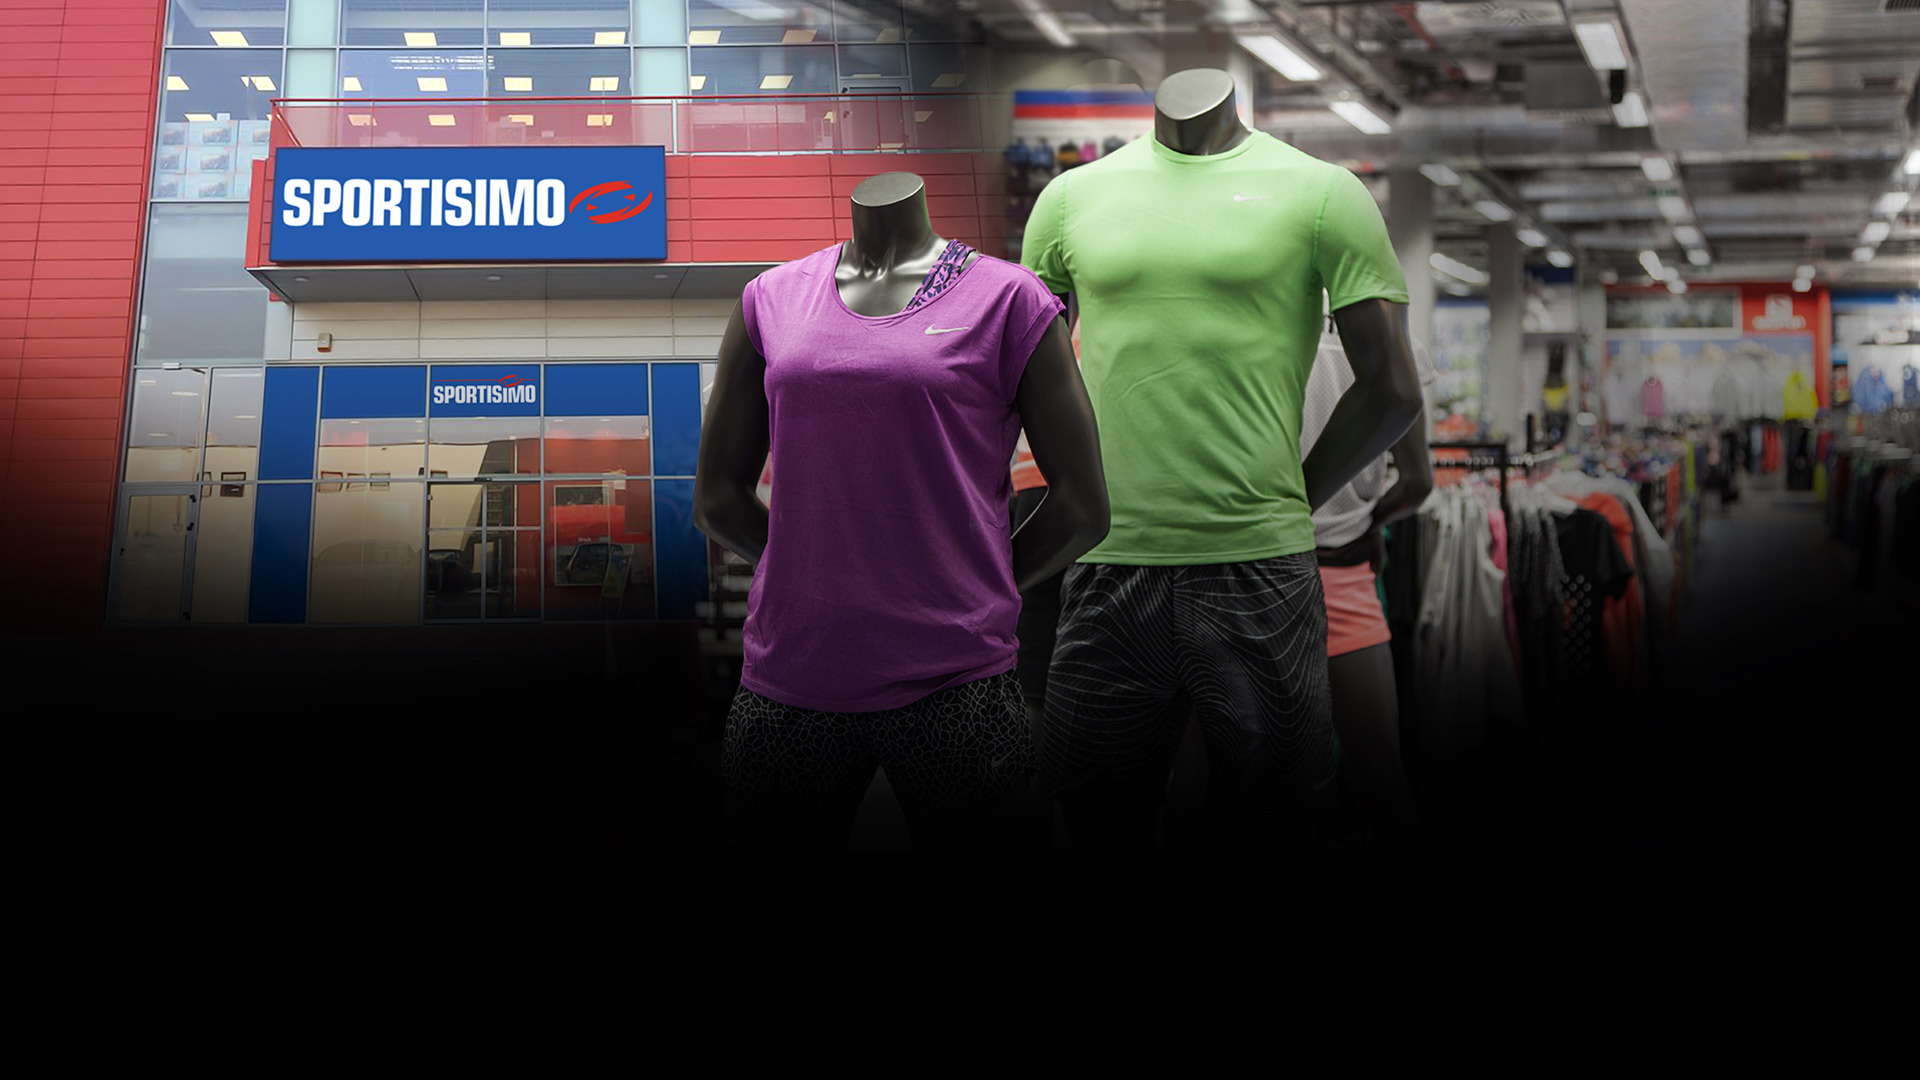 Magazin nou în Slatina